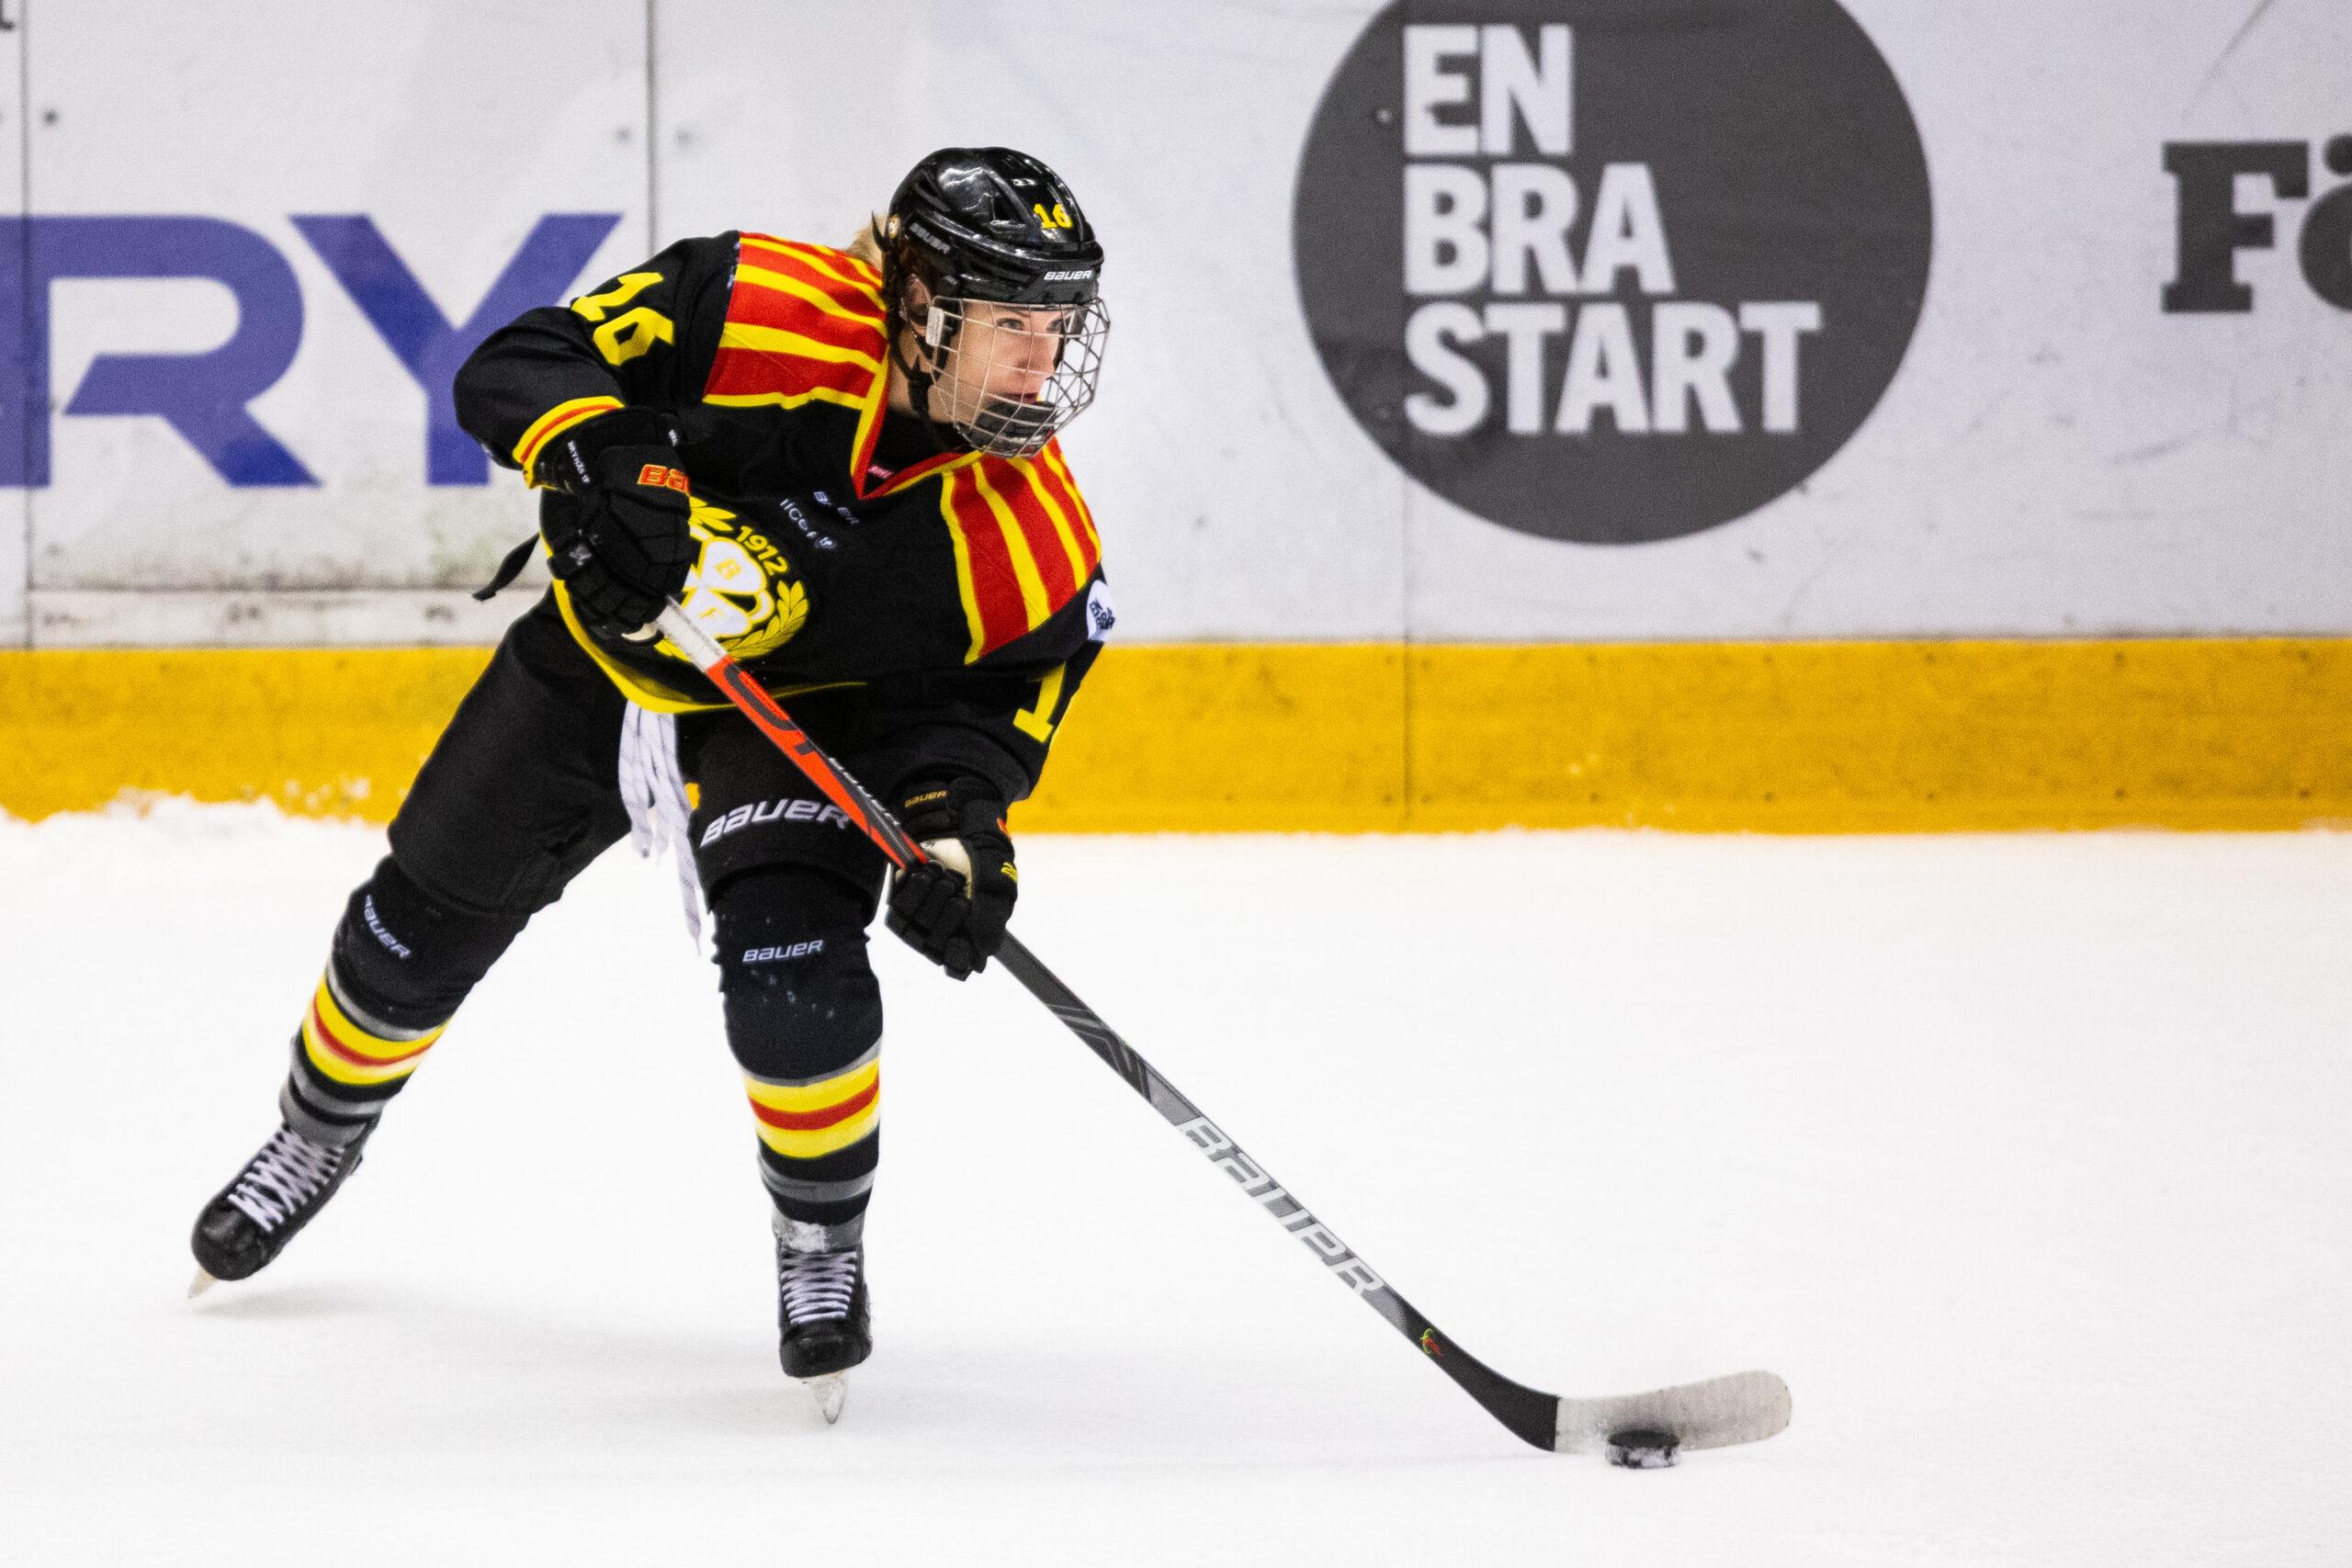 Kateřina Mrázová bäst i SDHL – vinnare av Guldhjälmen 2020/2021